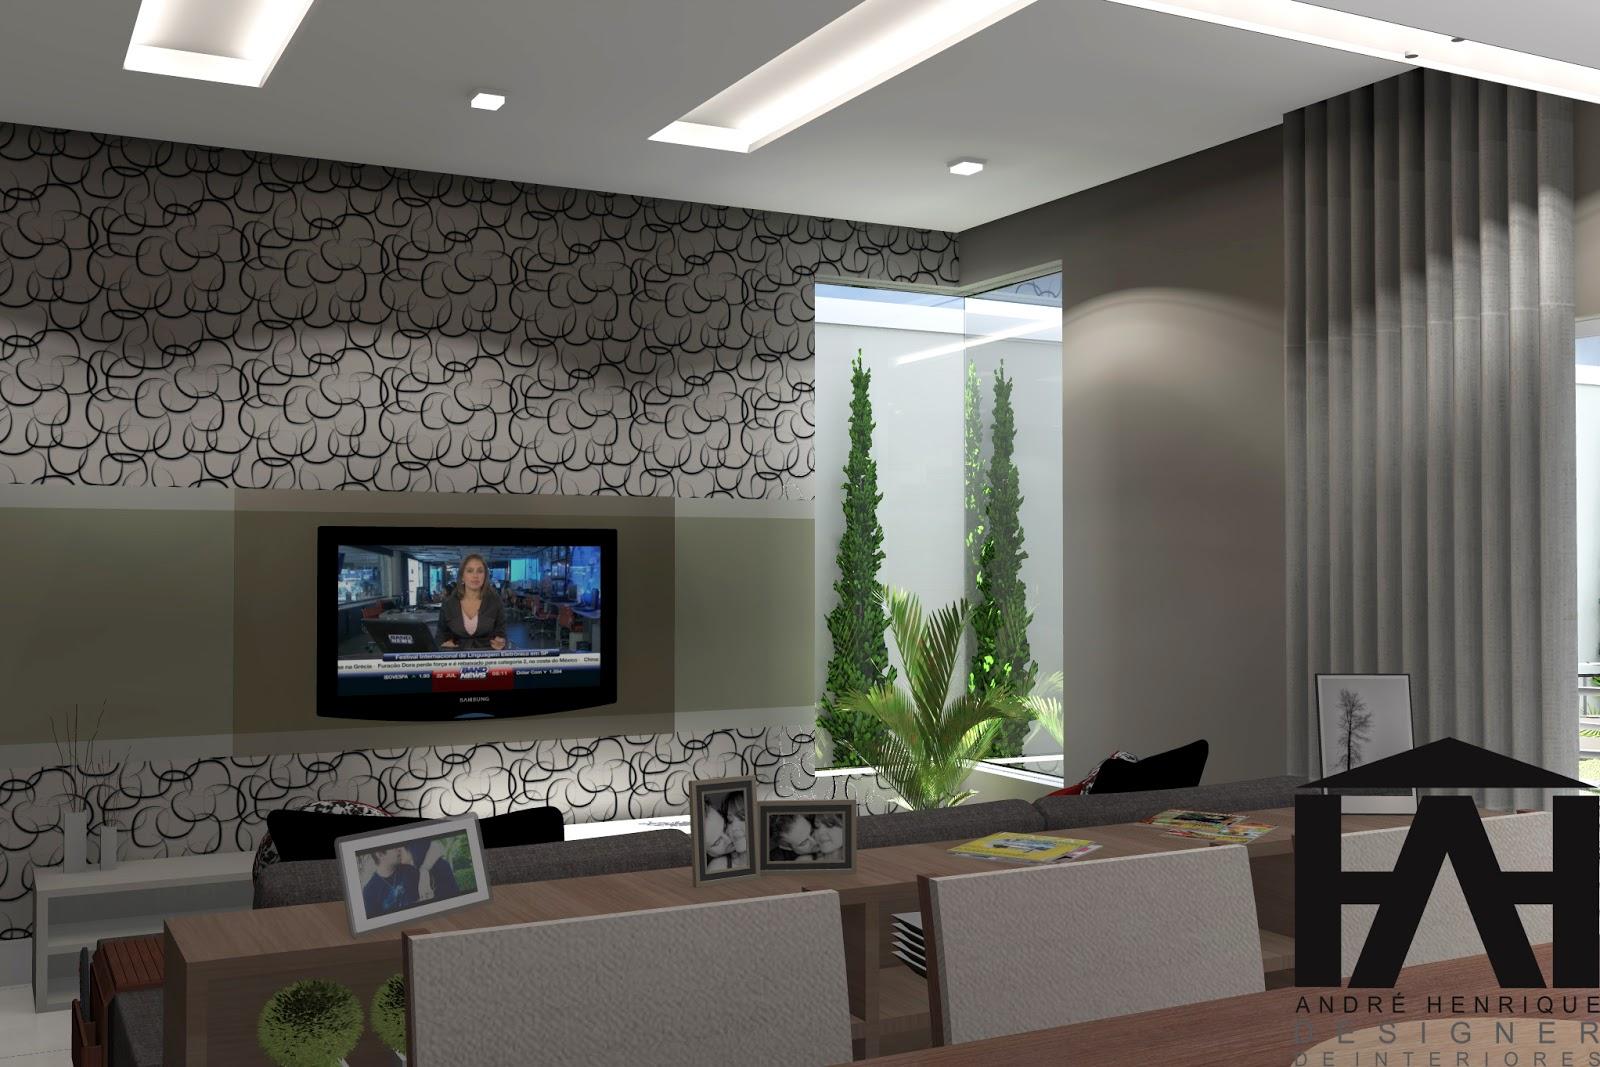 #334764 Designer de Interiores : Projeto Residencial ! sala cozinha e sala  1600x1067 px Projeto Cozinha E Sala #2513 imagens